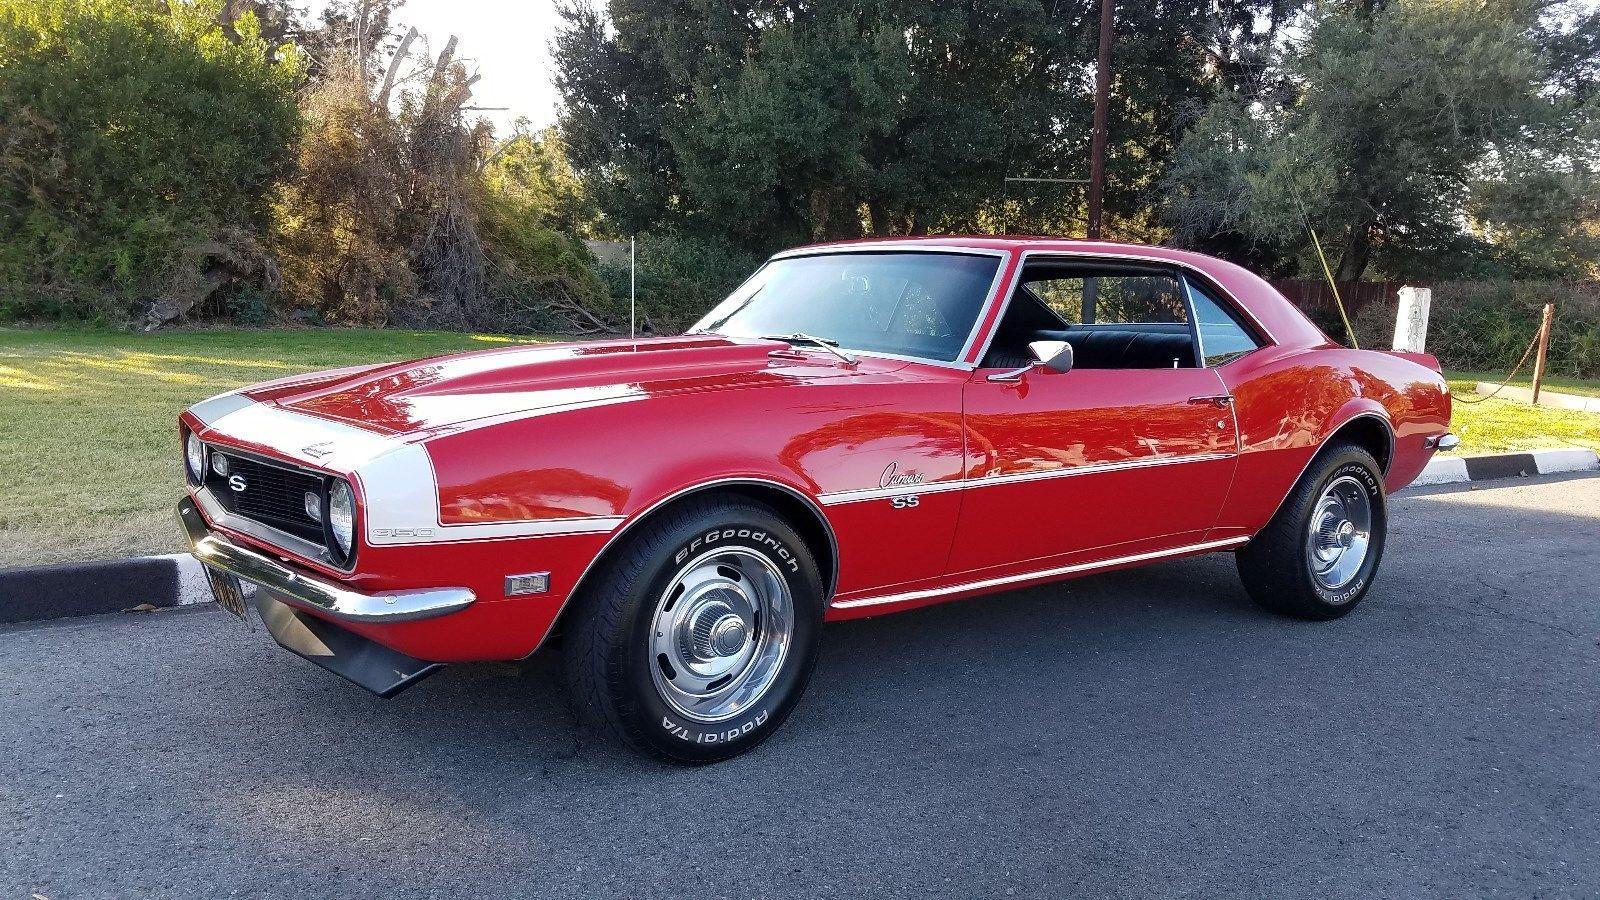 Great 1968 Chevrolet Camaro Super Sport Ss Muscle Car Tribute Restomod Fully Restored Ca Rust Free 69 2017 2018